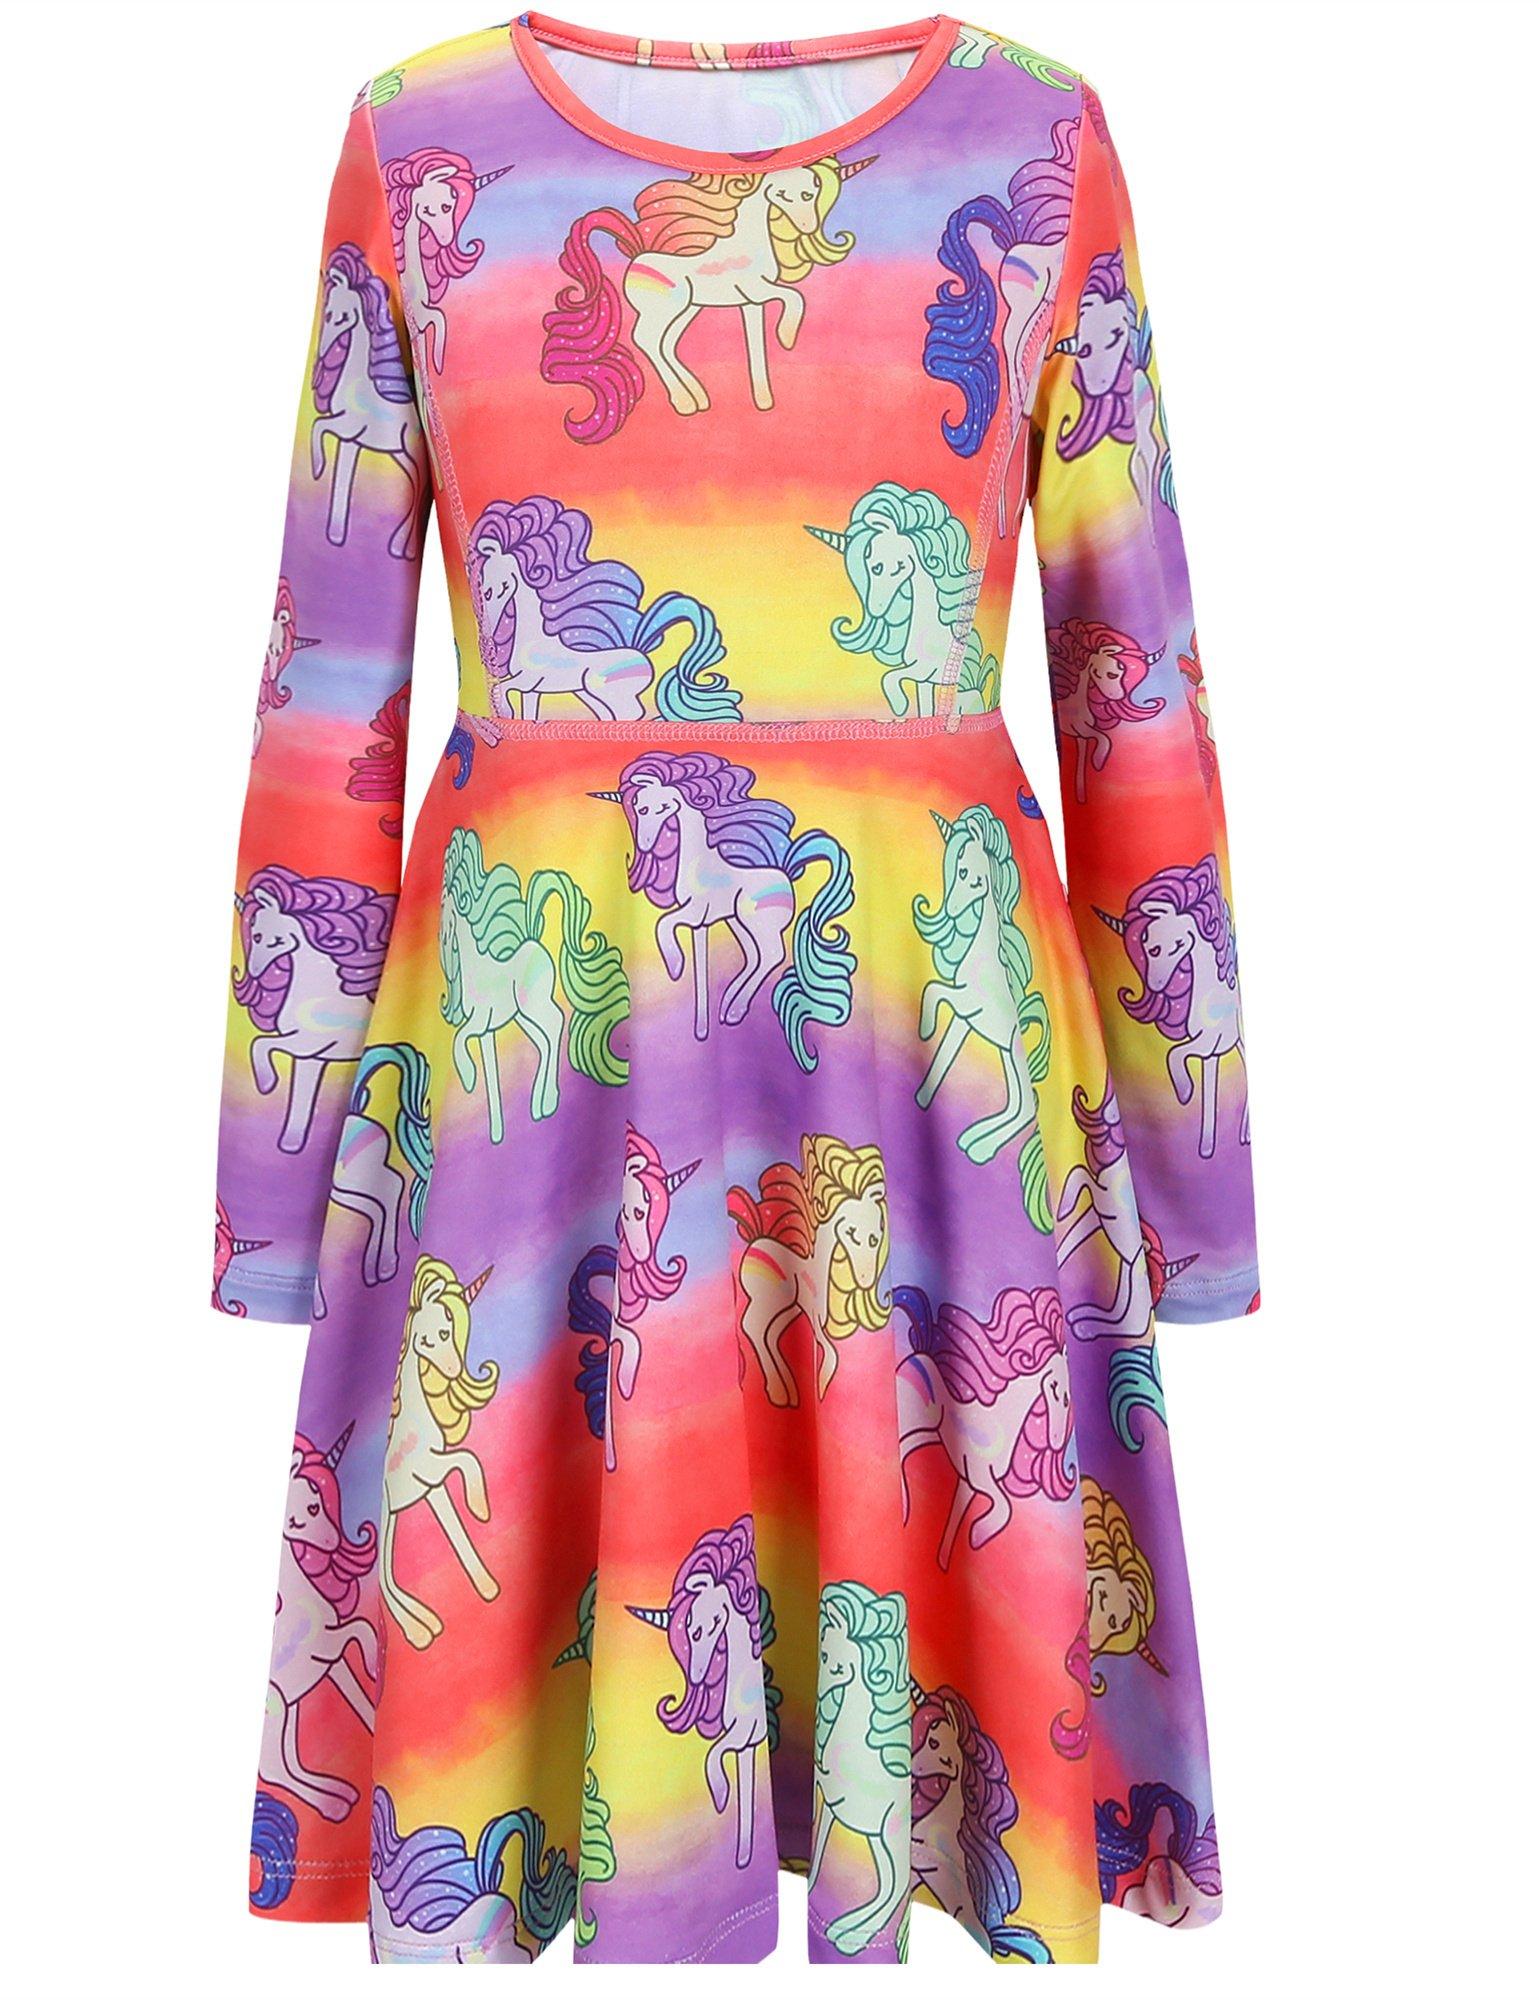 Jxstar Girls Long Sleeve Dress Winter Dress Hawaiian Dress Birthday For Girls Unicorn 150